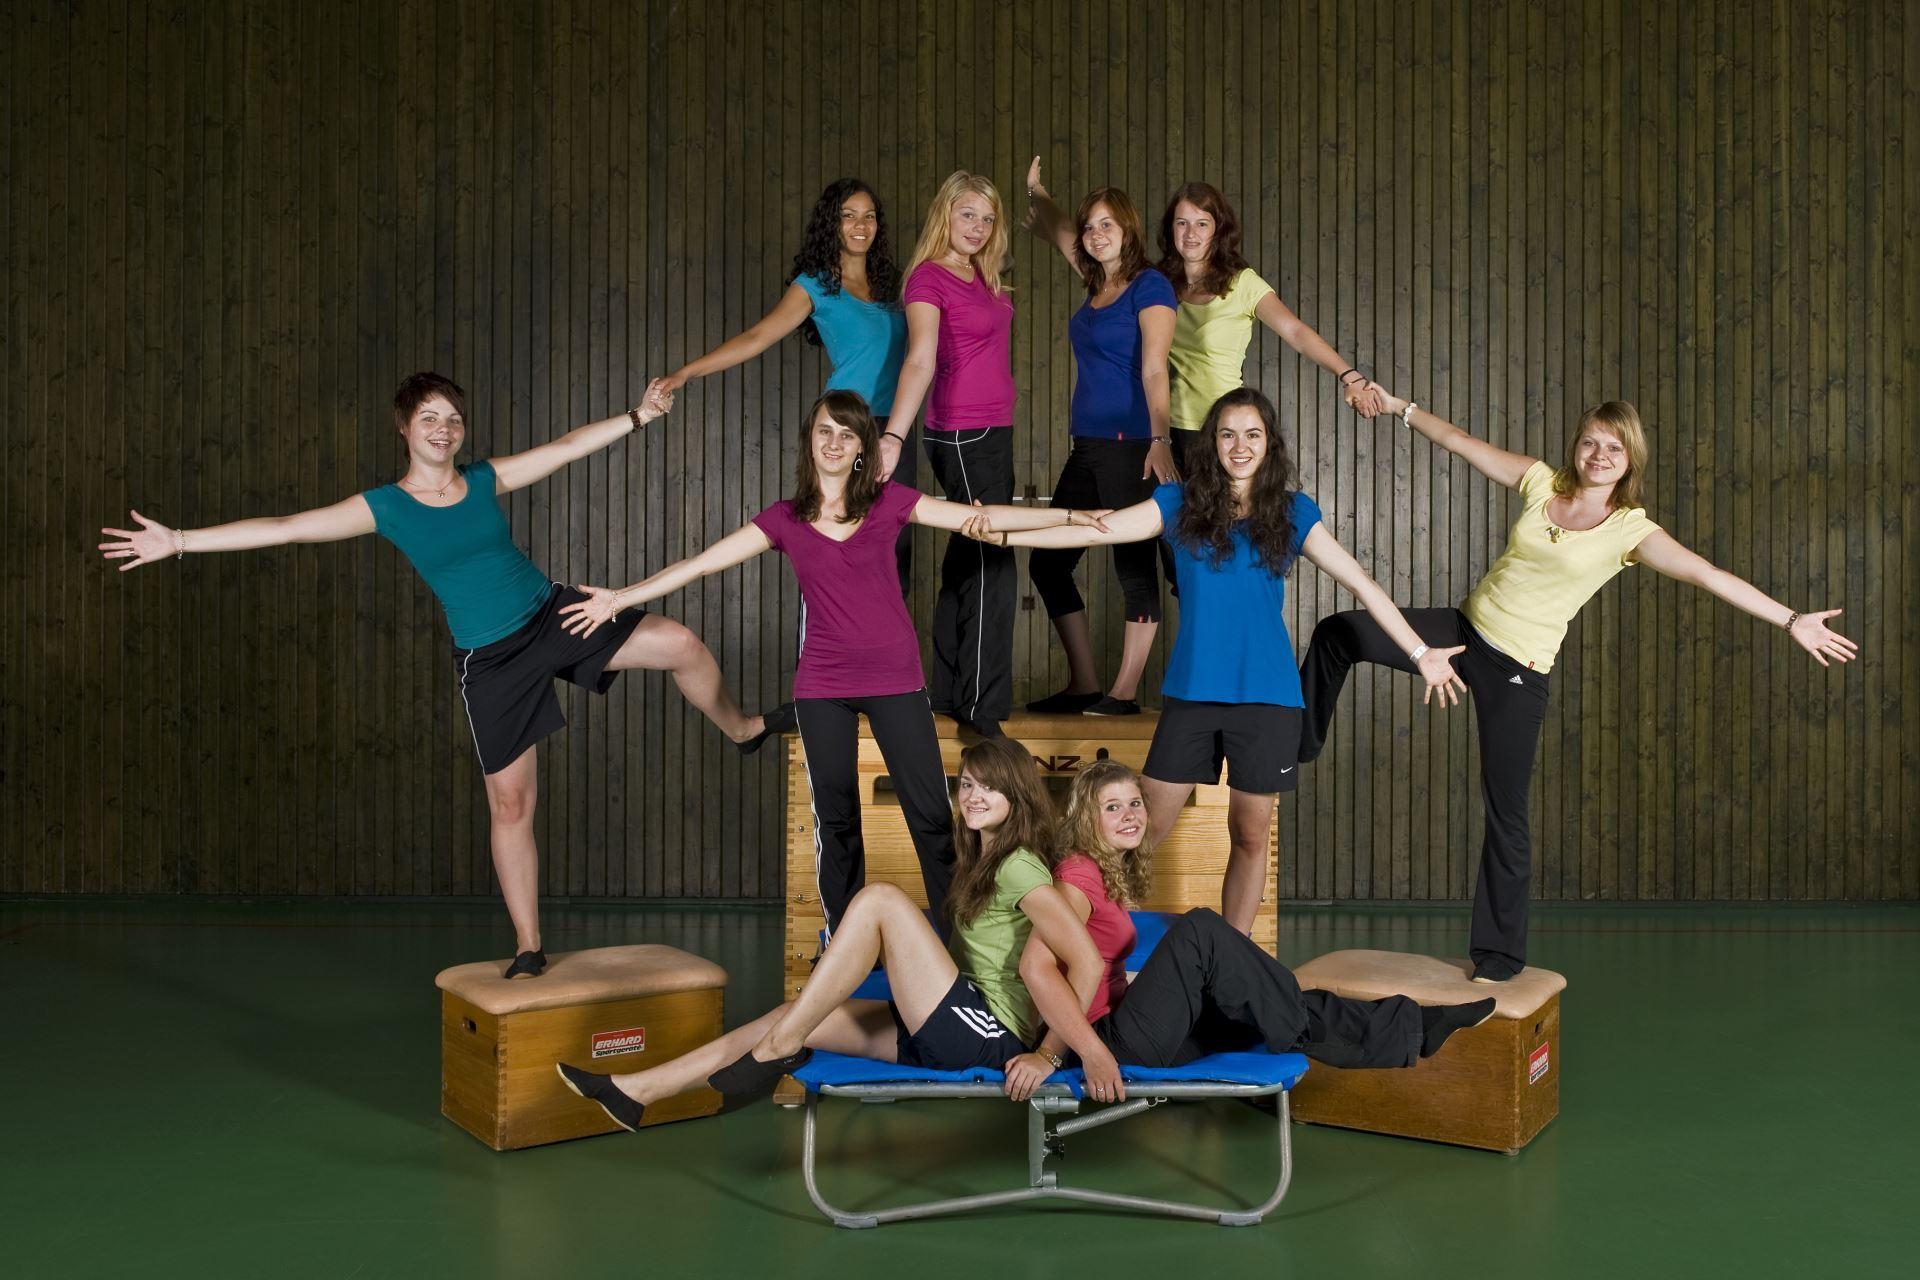 Jugendturnen (Gruppe 1) im Jahr 2010 (06)